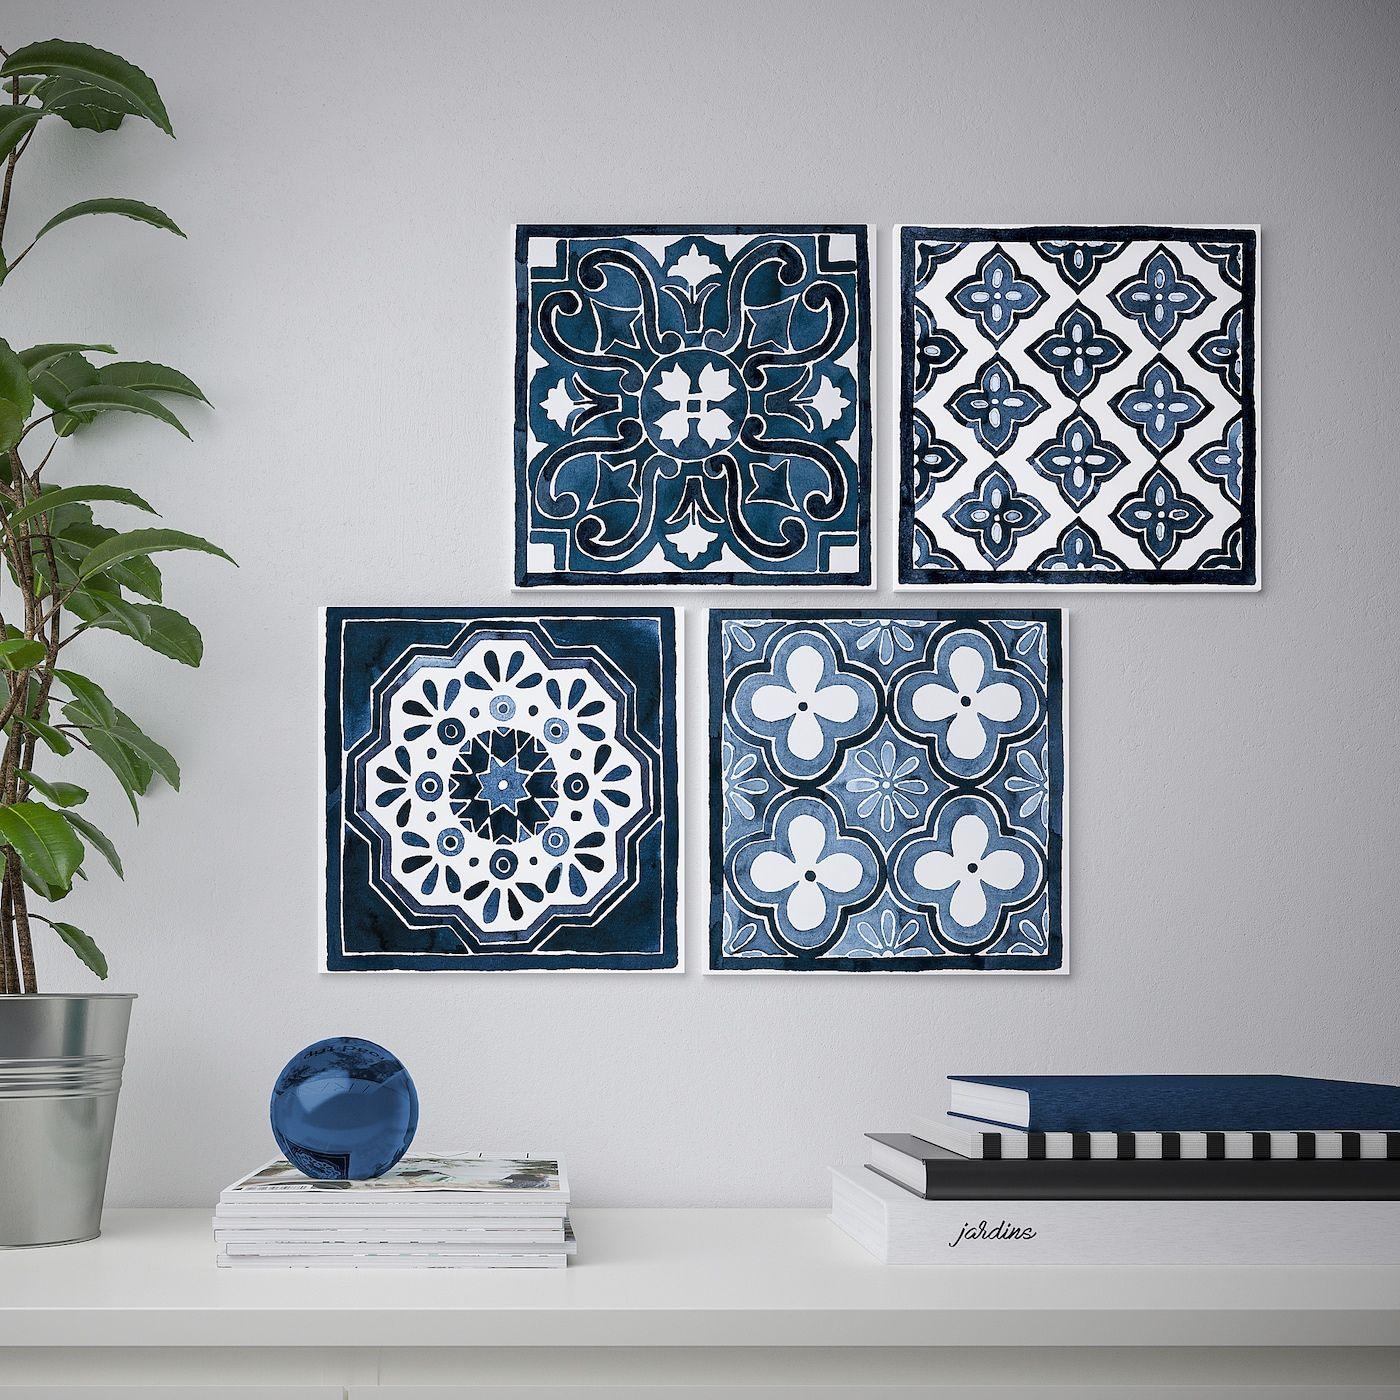 Ikea pjatteryd blue patterns picture beach house